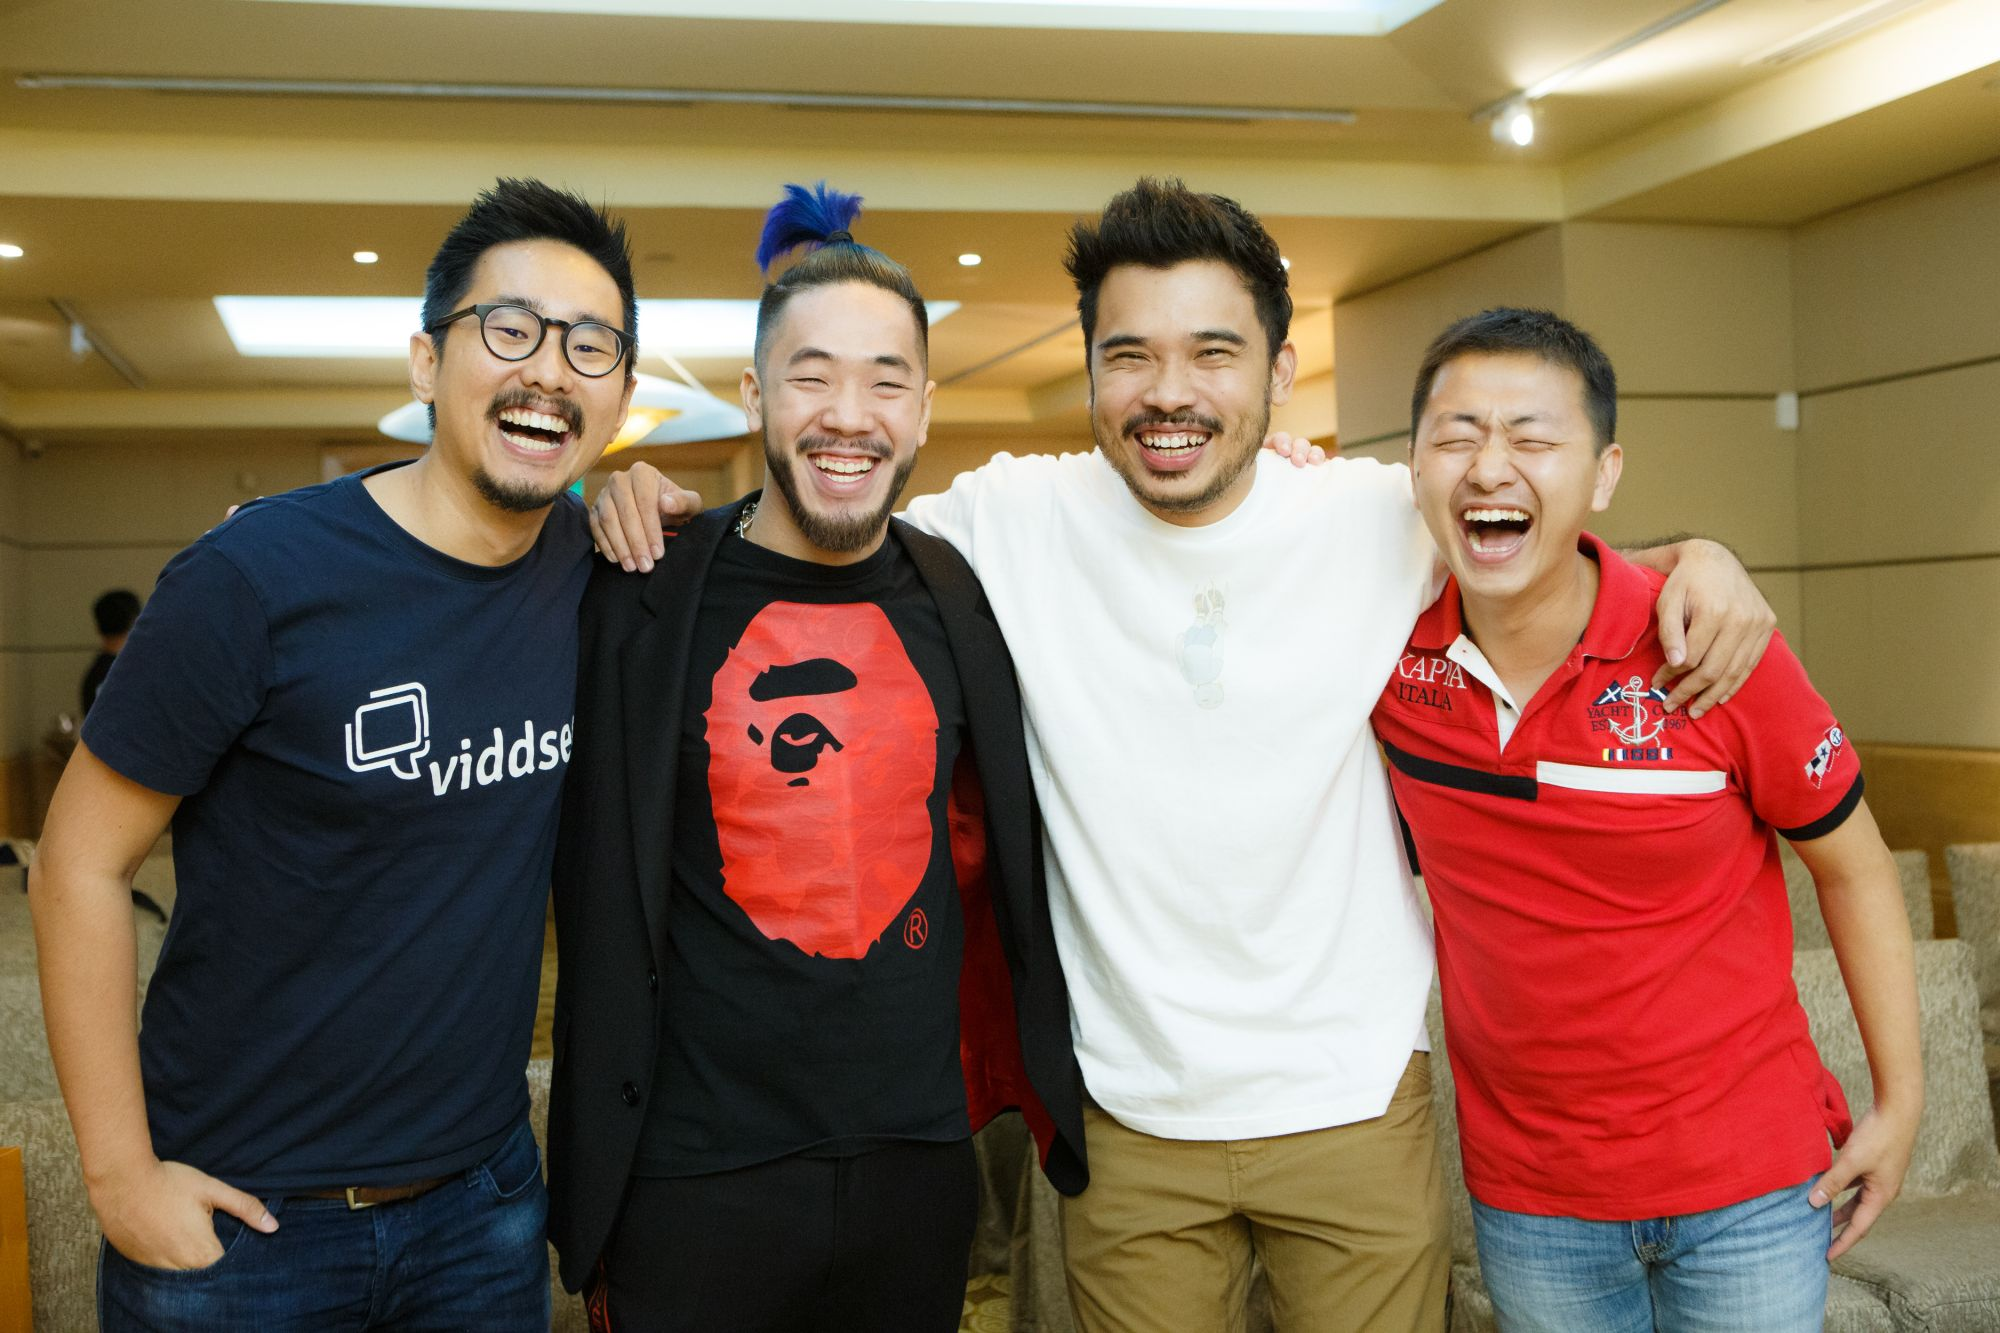 Ho Jia Jian, Shigga Shay, Jackson Aw and Oon Tian Sern